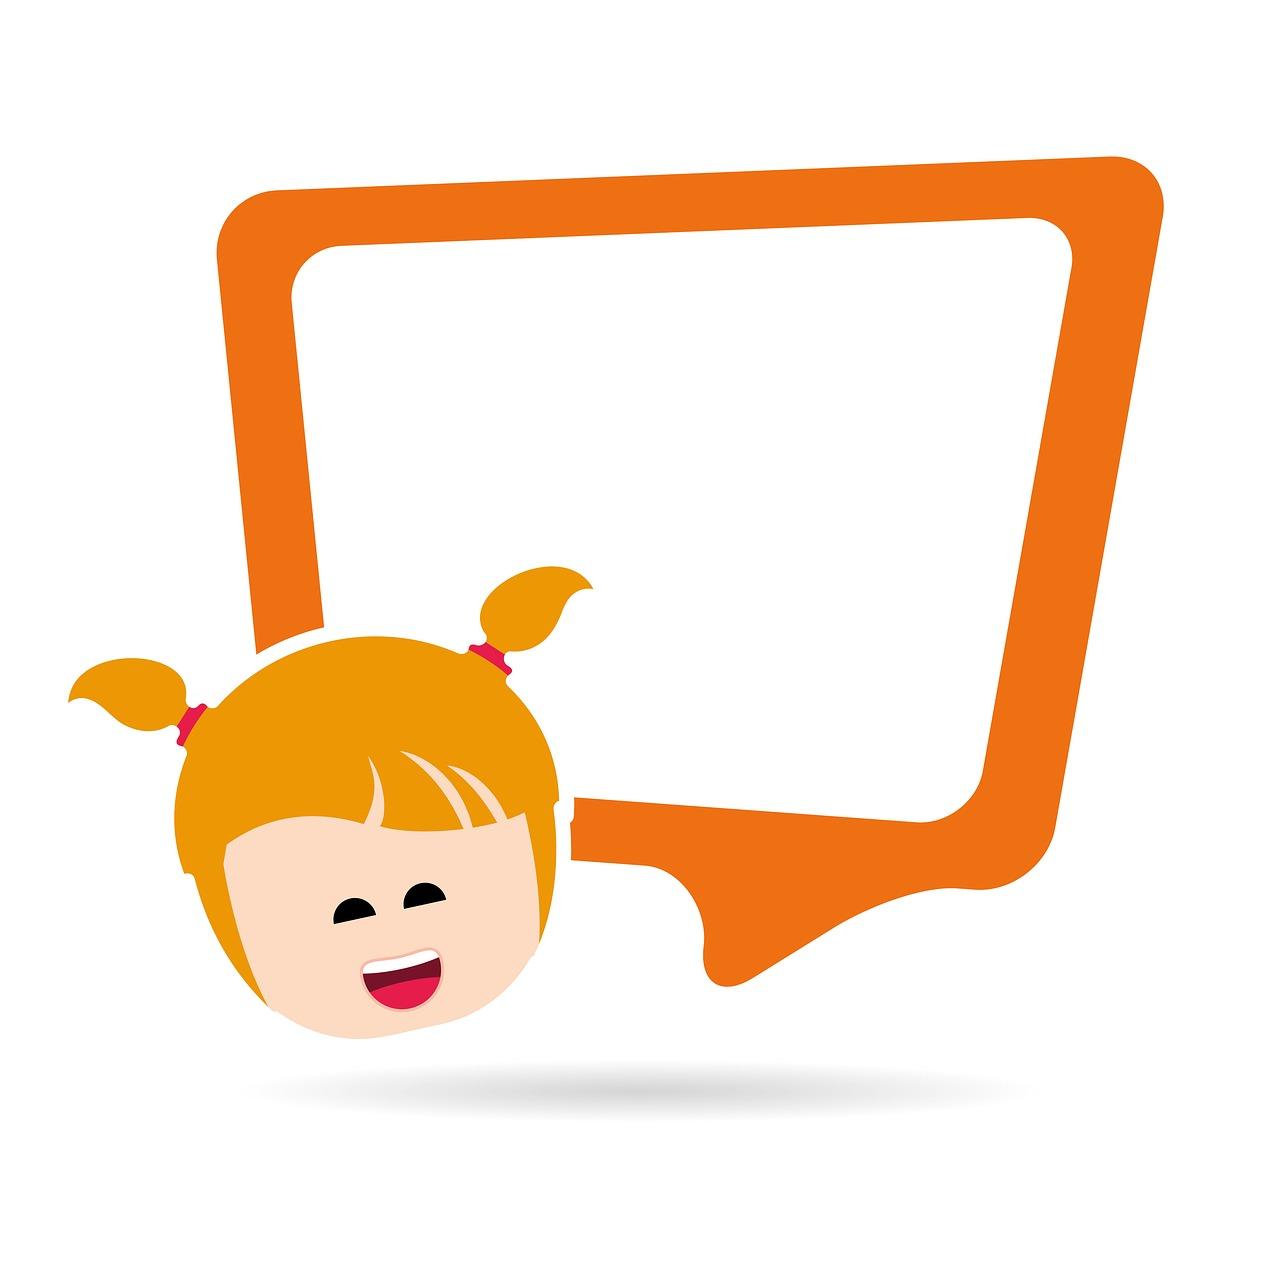 3,815 Baby Talking Illustrations, Royalty-Free Vector Graphics & Clip Art -  iStock